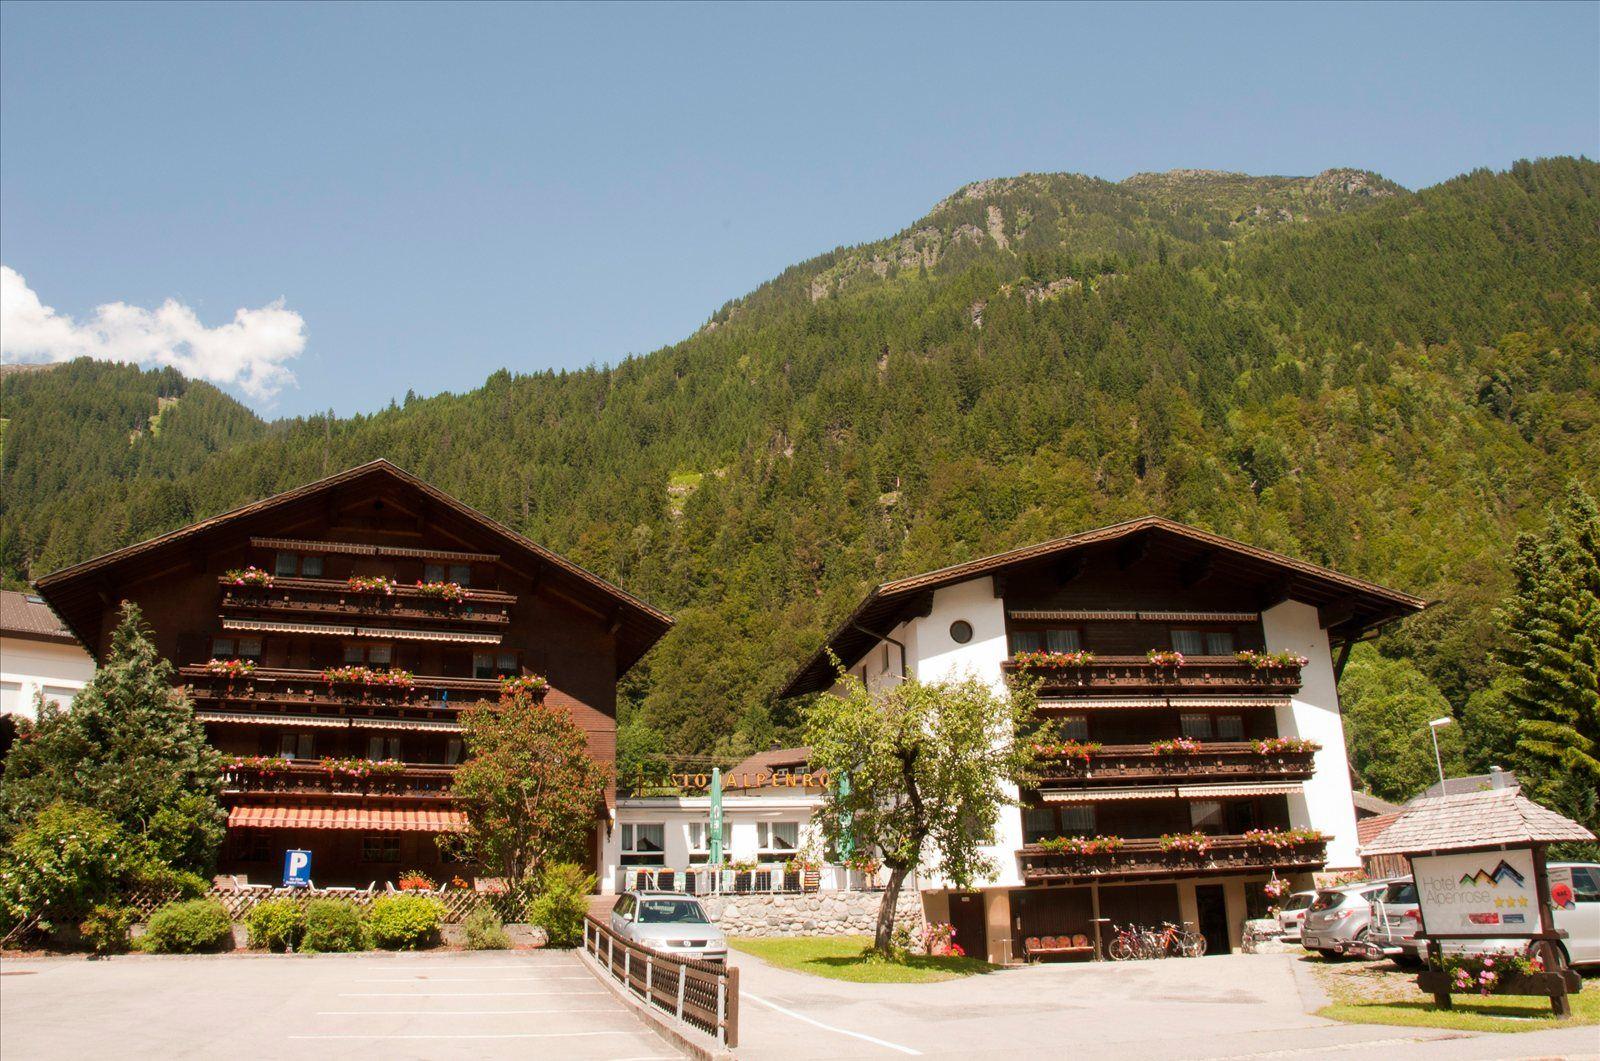 Hotel Alpenrose - St. Gallenkirch